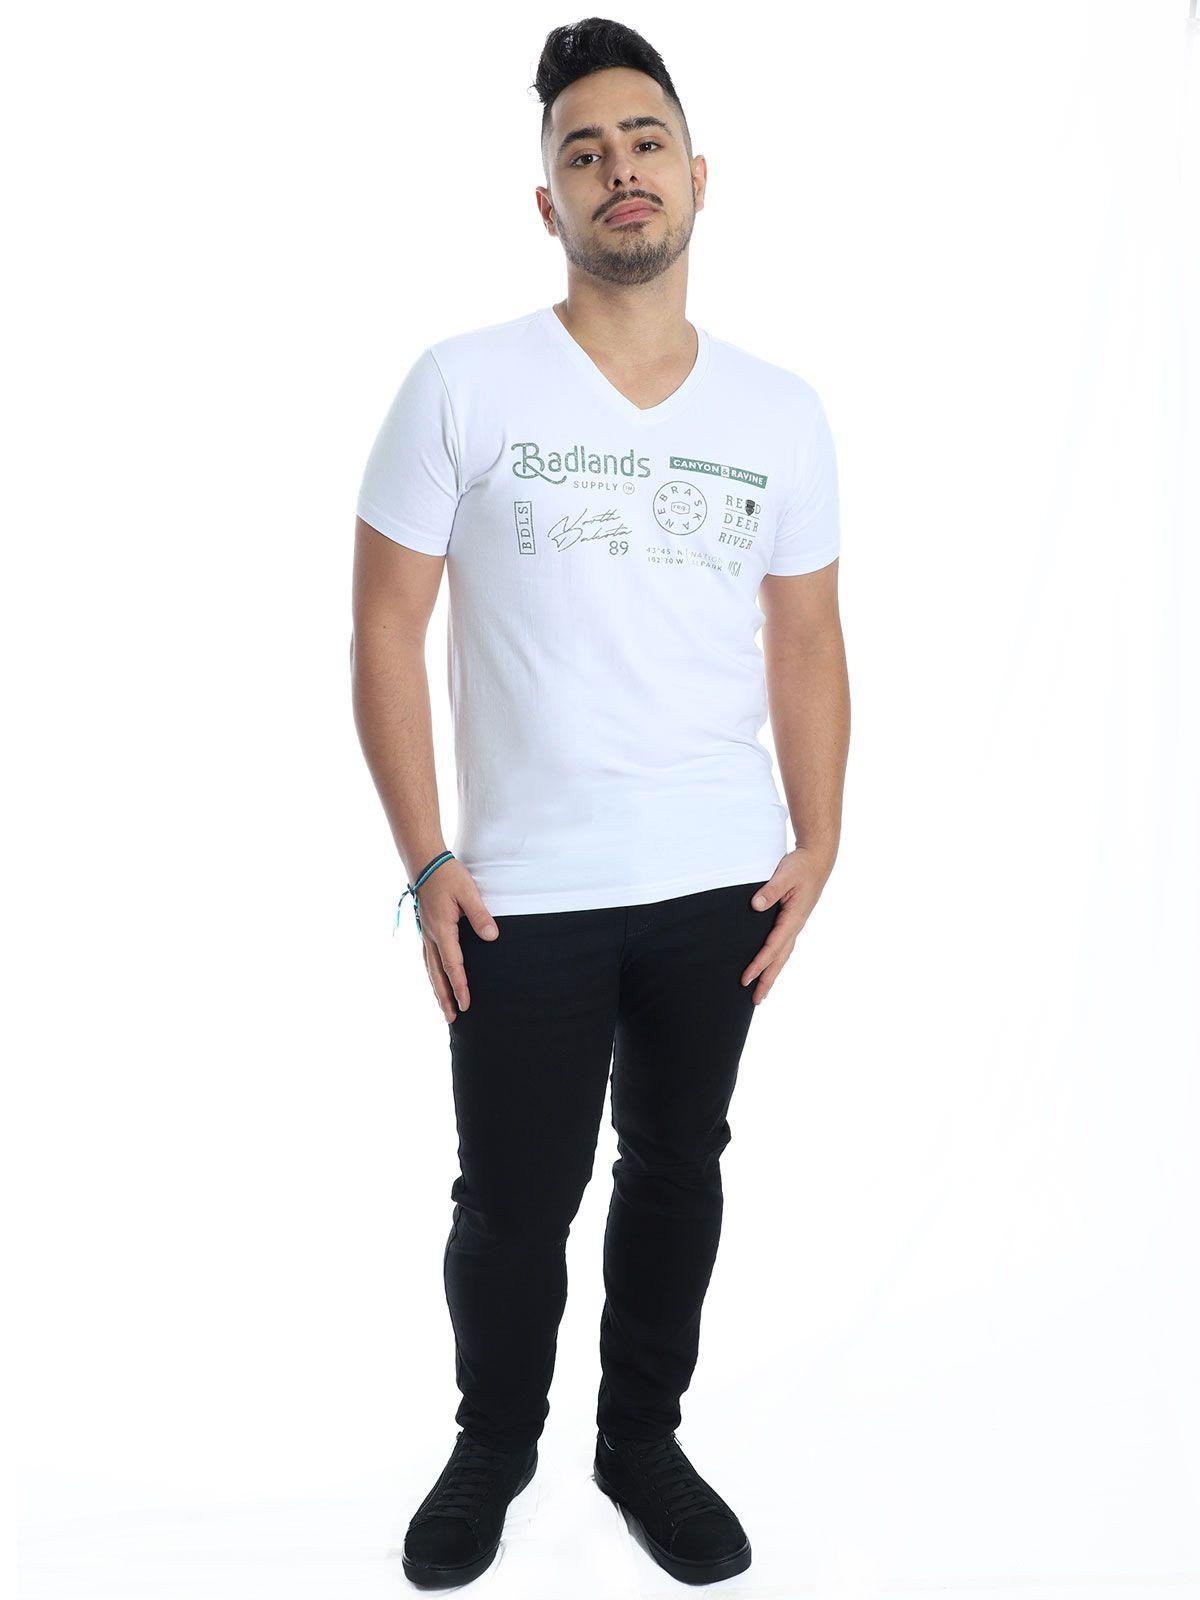 Camiseta Masculina Slim Fit com Elastano Decote V. Manga Curta Branca